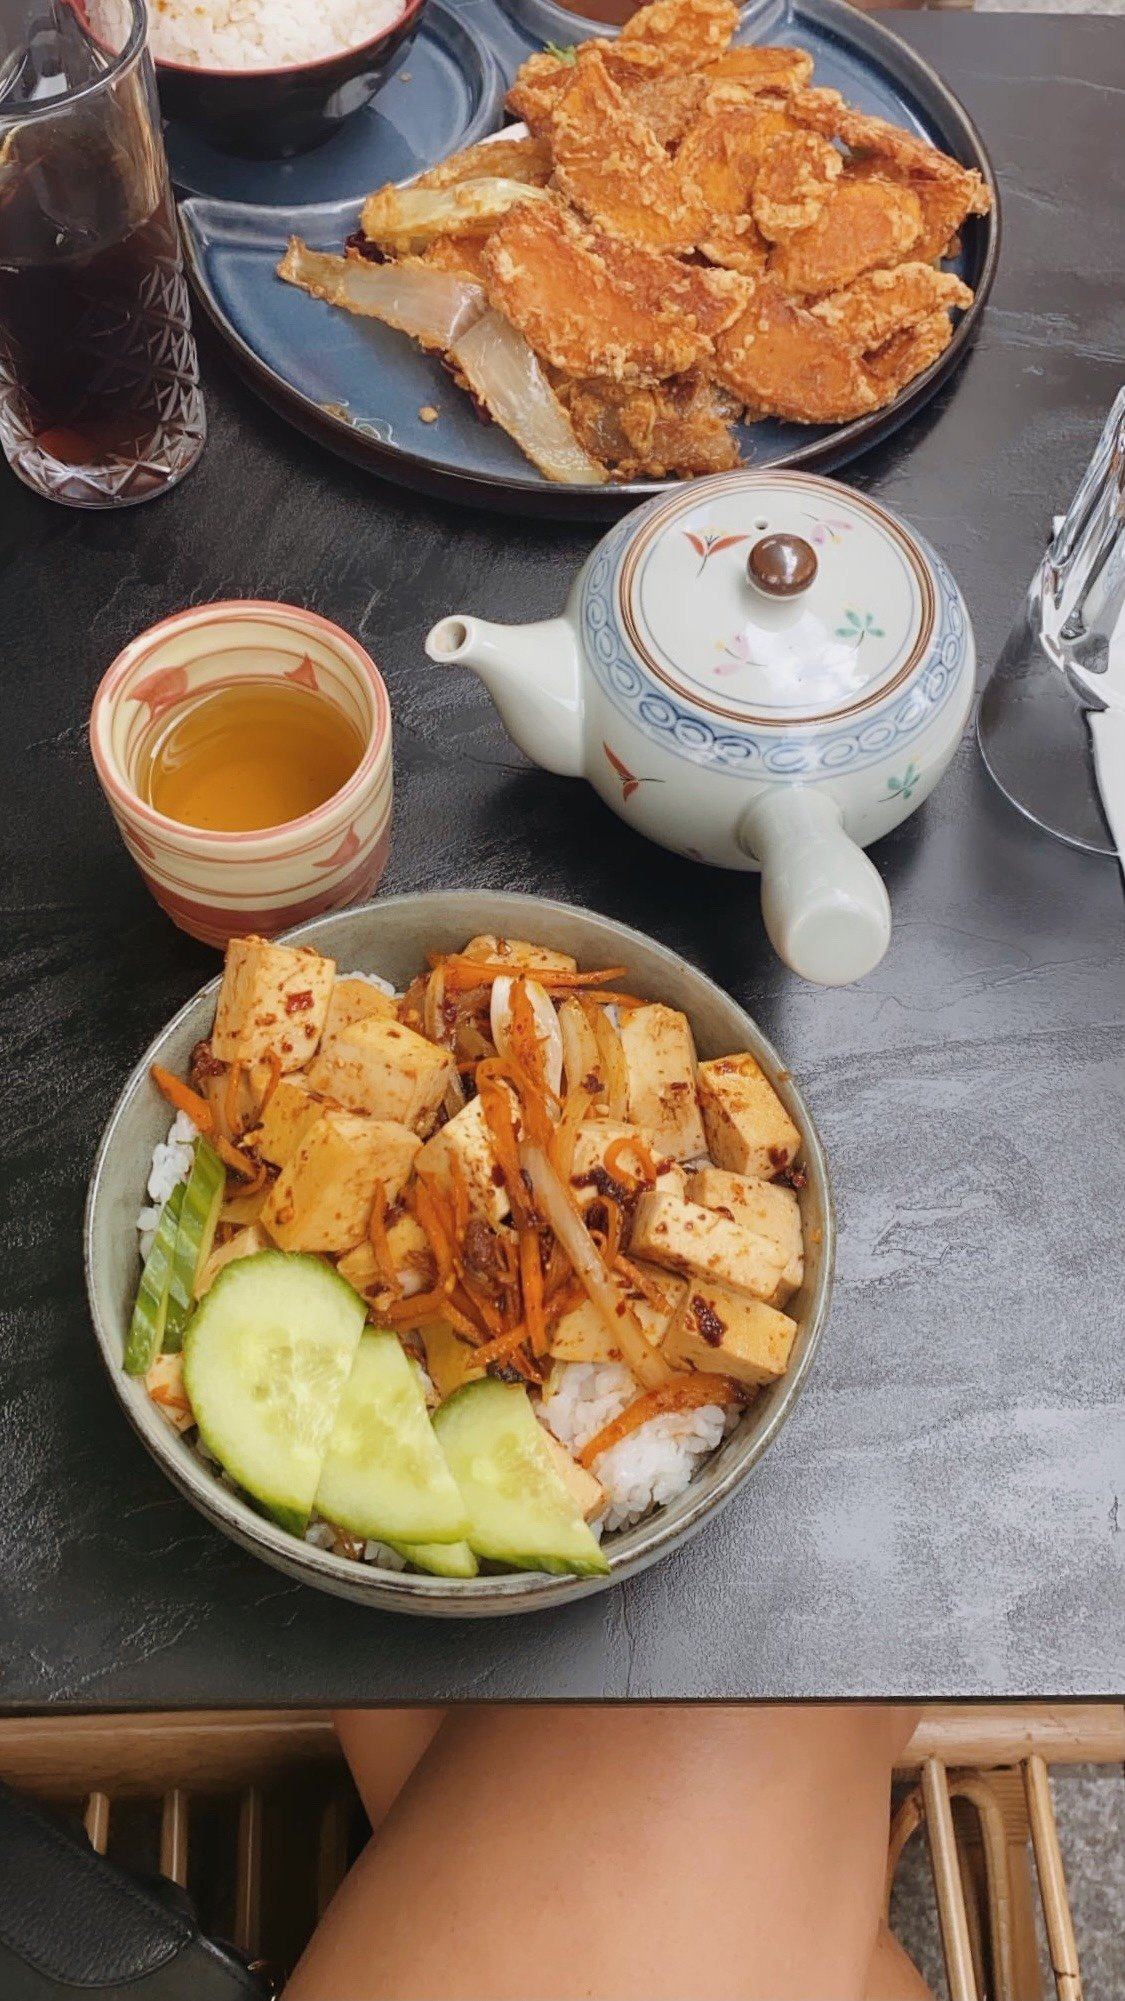 Hoki Sushi Les Halles, 3 Tipps für Paris-Nowshine ü40 Blog